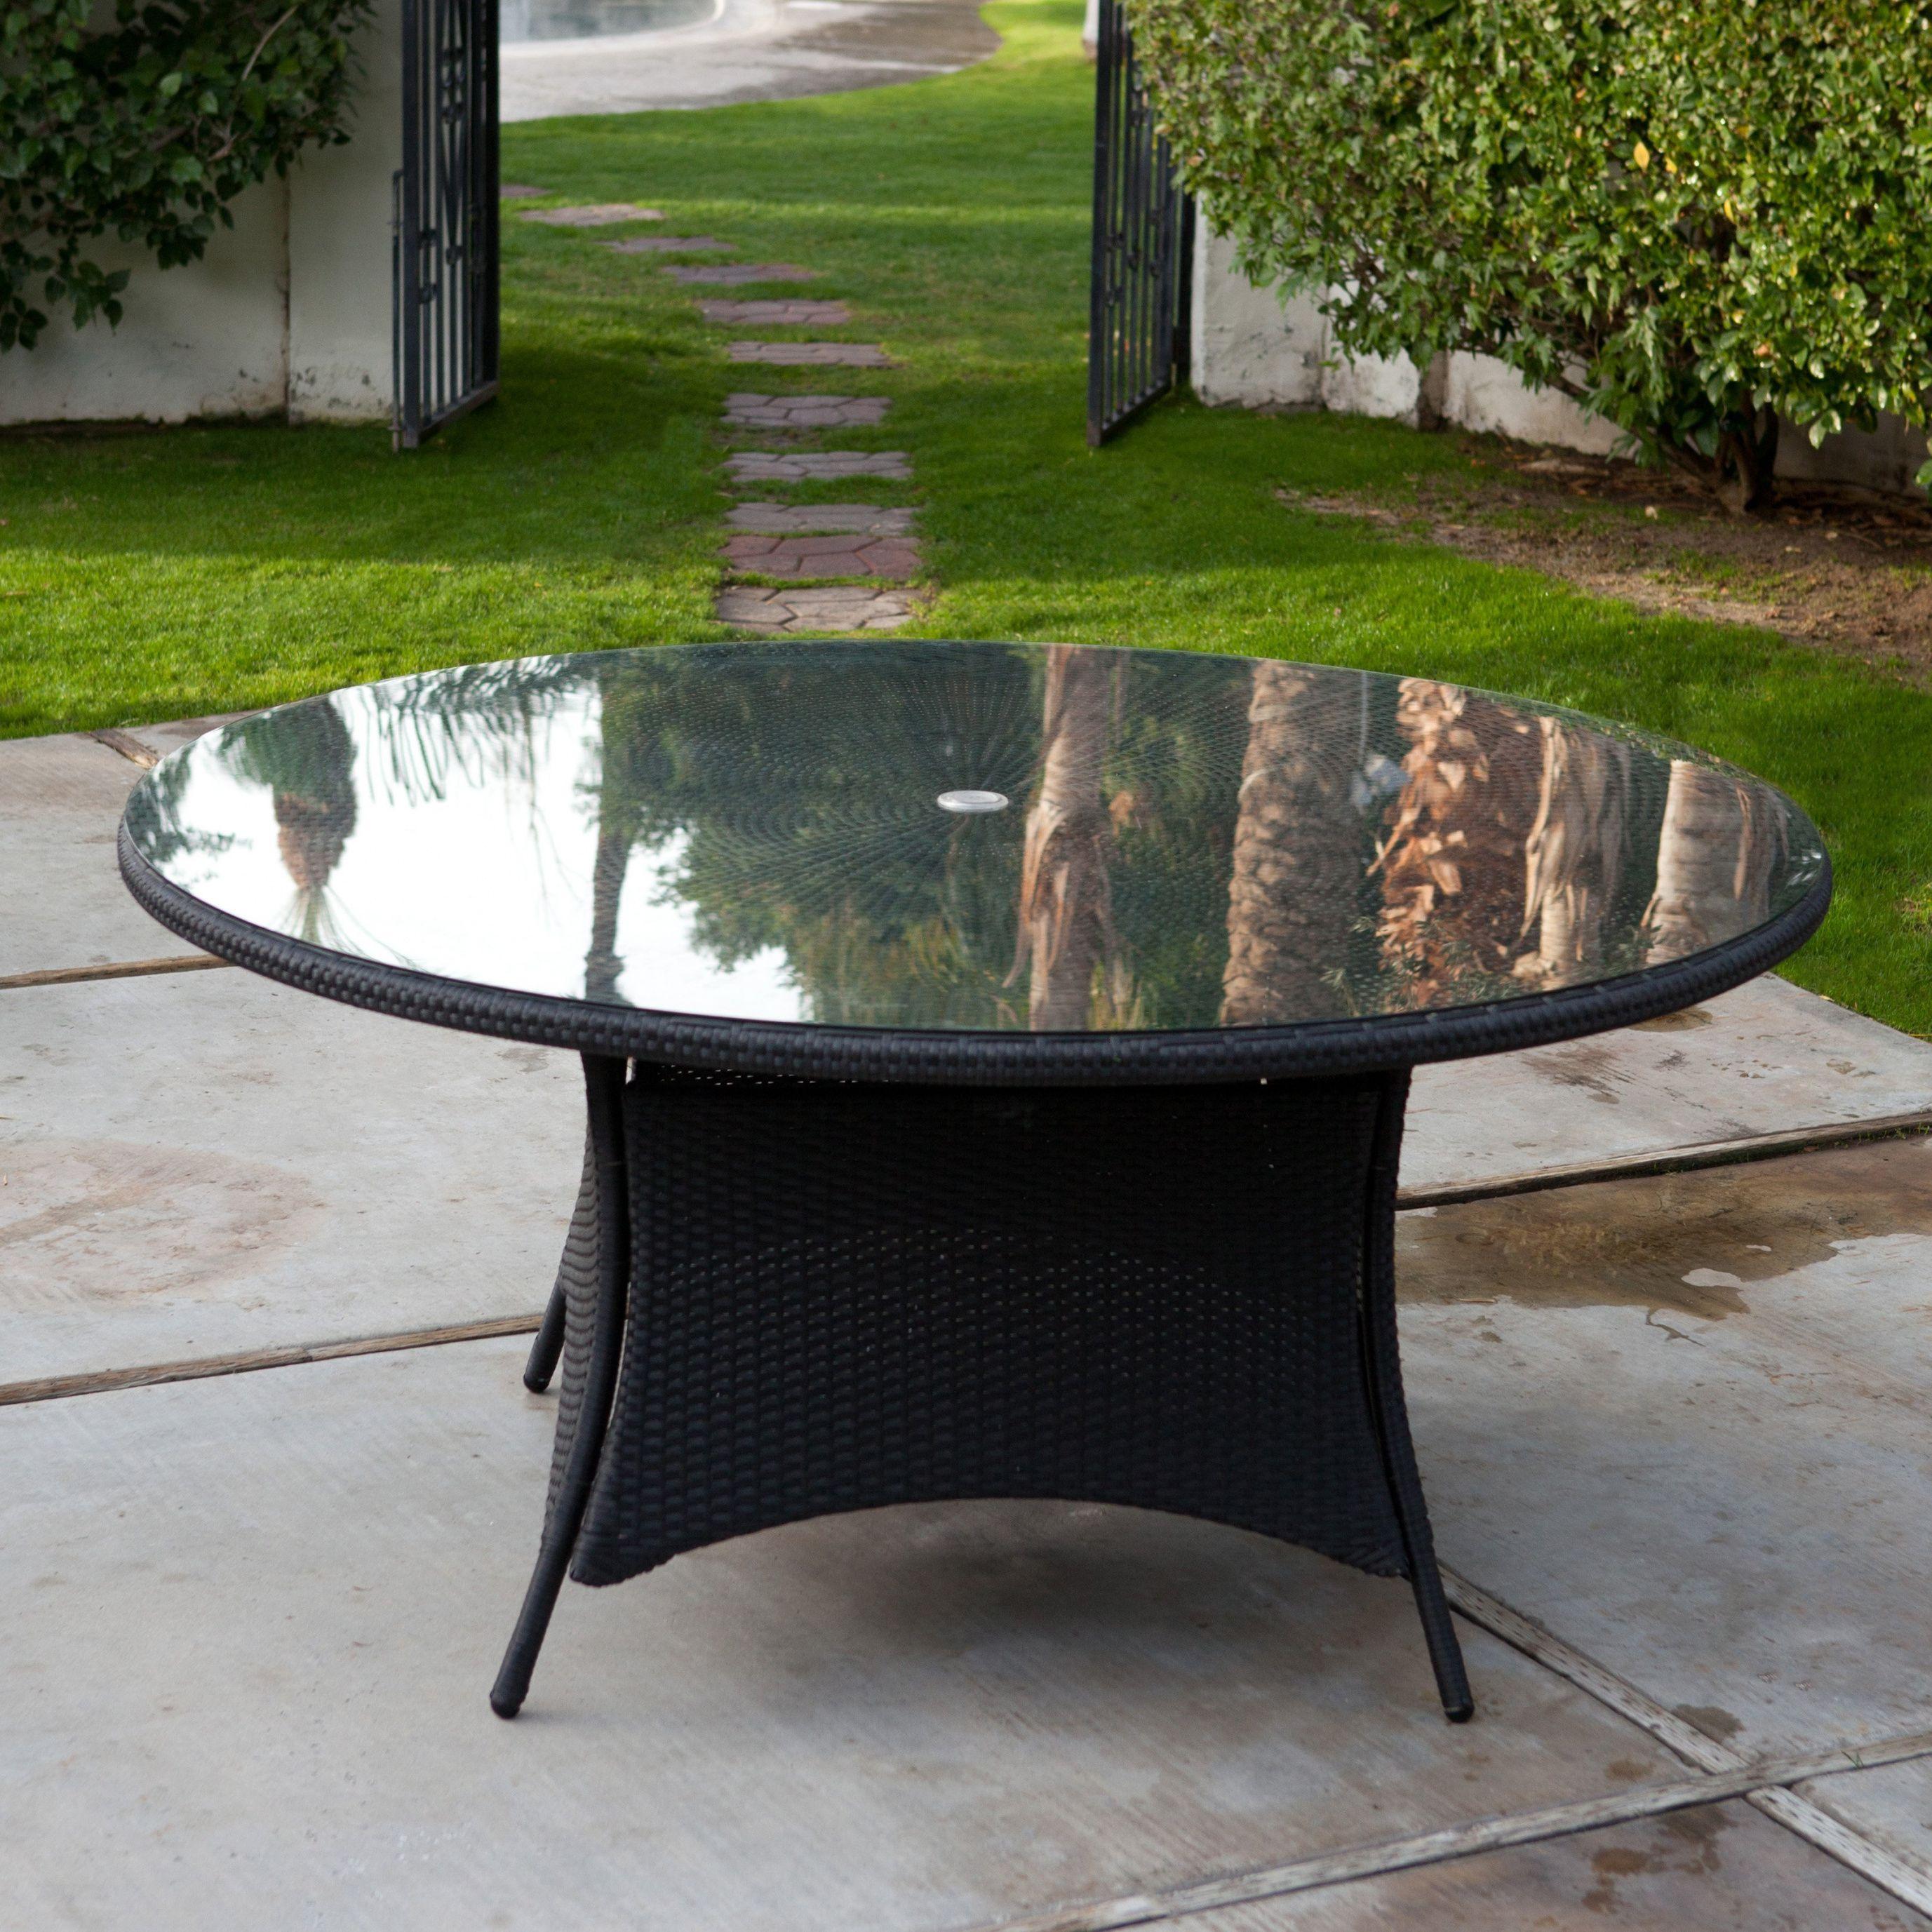 Martha Stewart Outdoor Furniture Replacement Parts Best Home